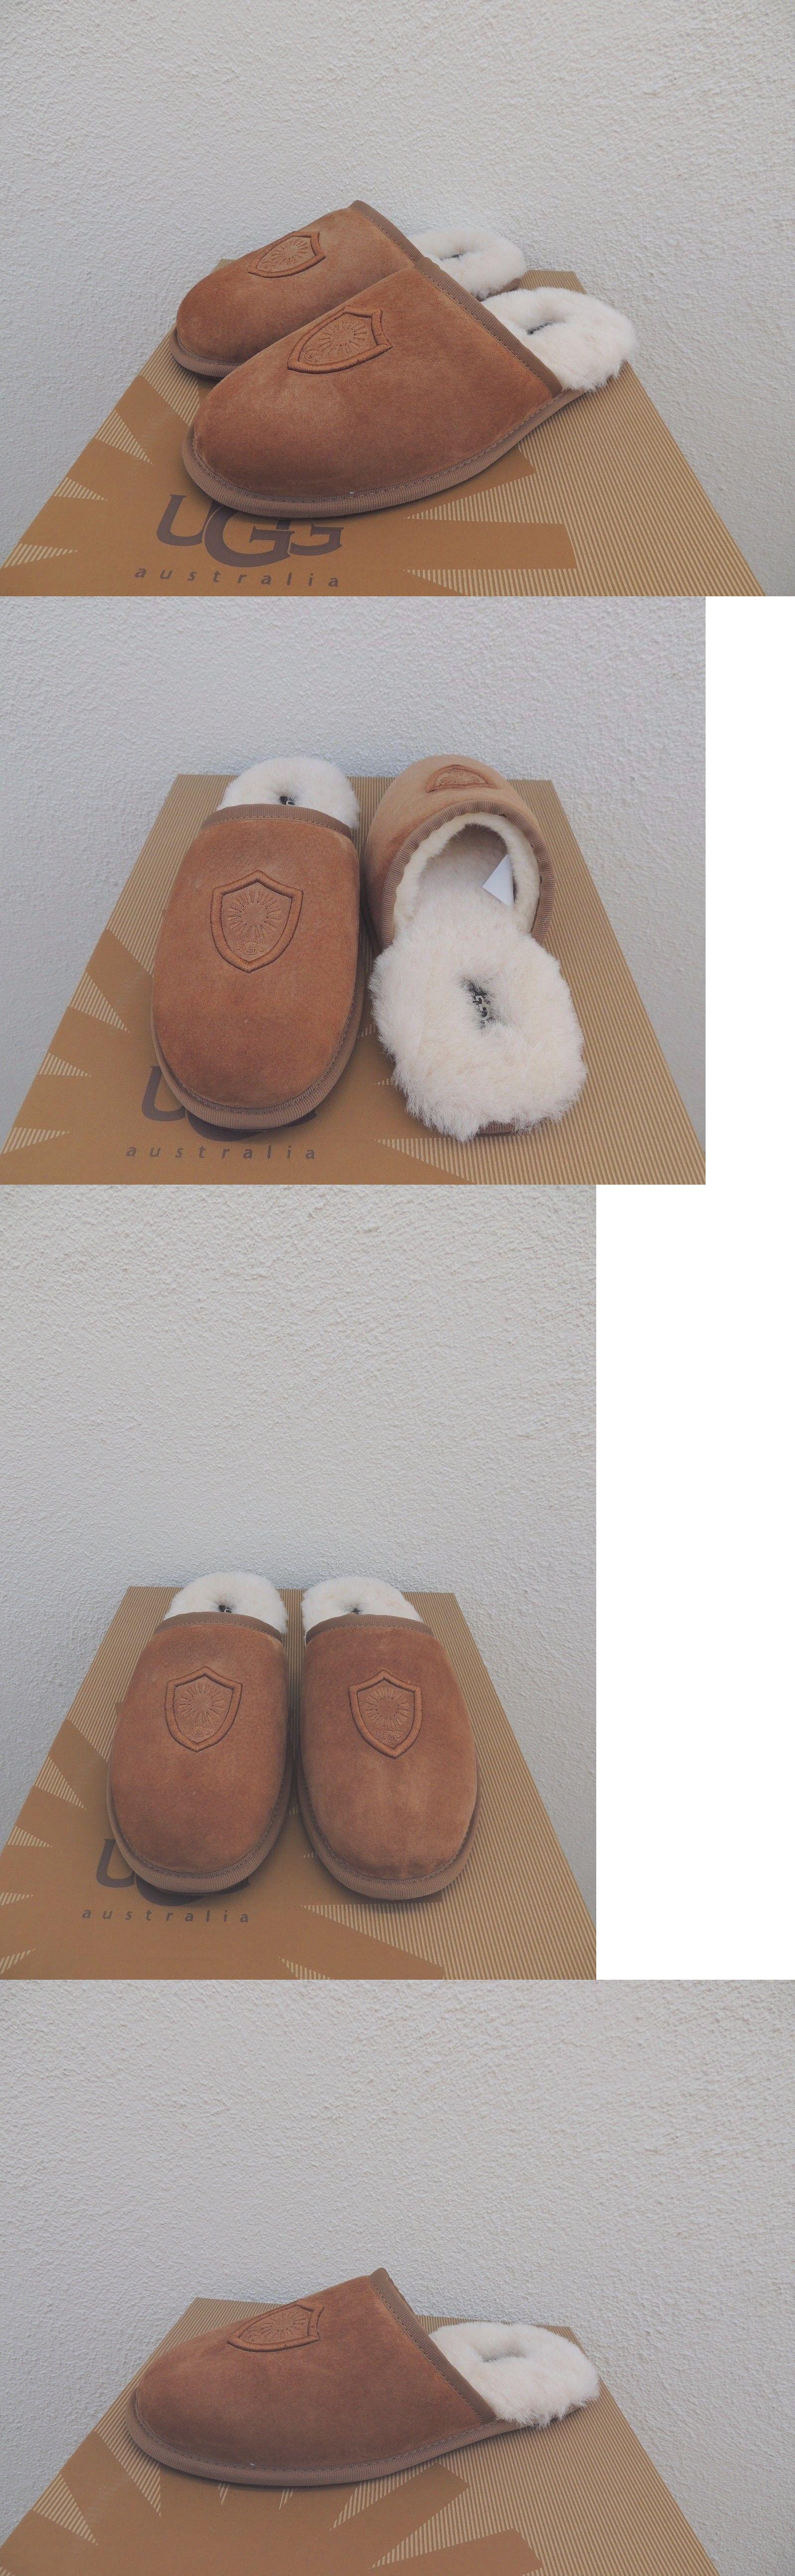 a83169f0f33 Slippers 11505  Ugg Scuff Noble Chestnut Suede Sheepskin Slippers ...